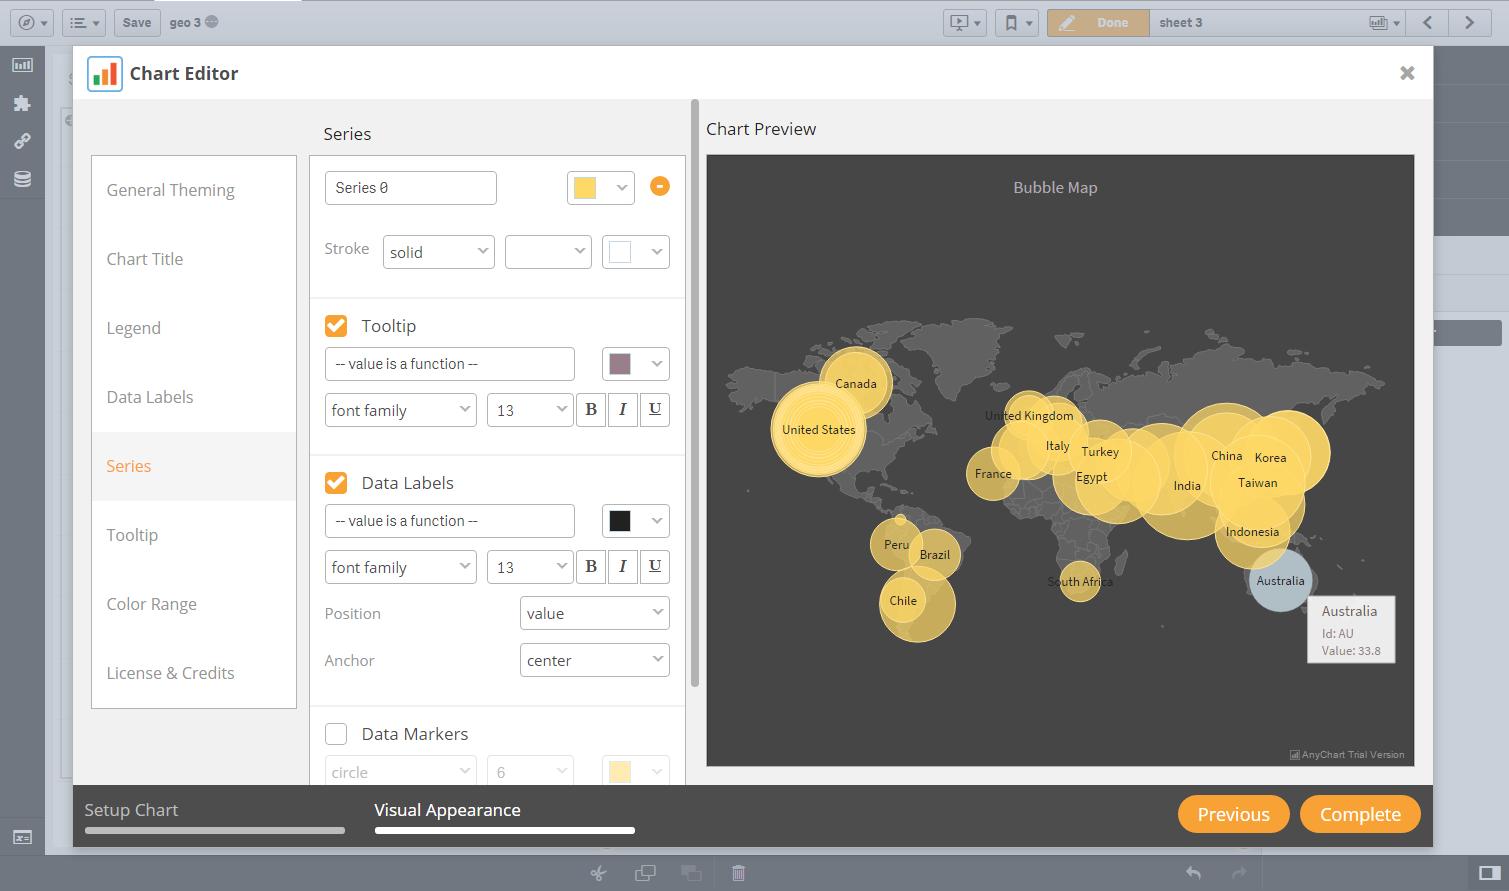 GitHub - AnyChart/AnyChart-Qlik: AnyChart Extension for Qlik